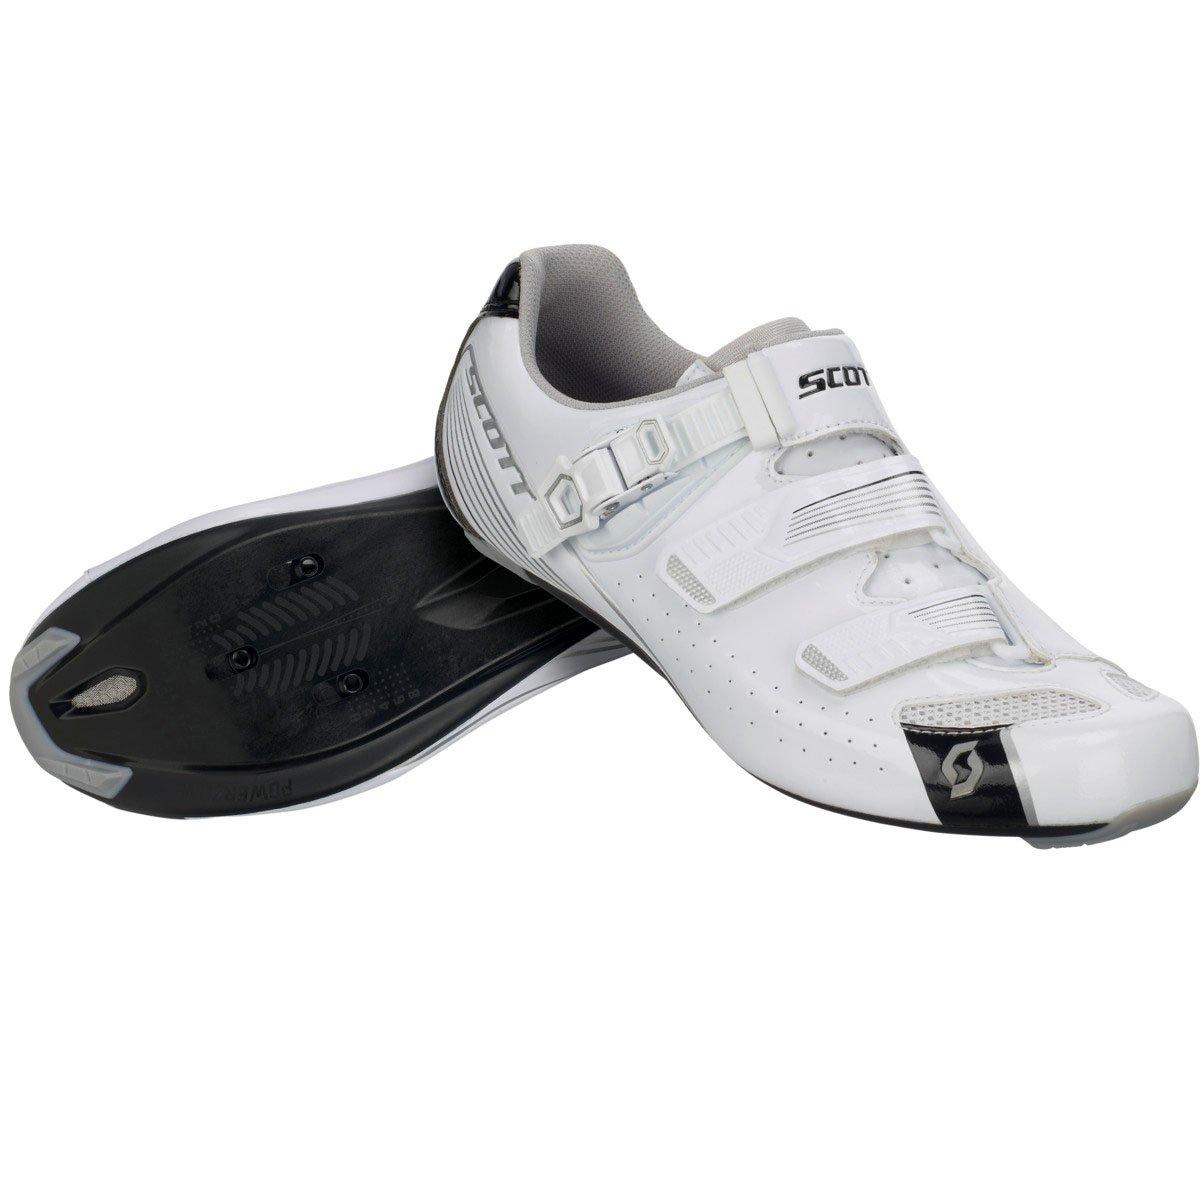 Scott 2017 Womens Road Pro Lady Bike Shoes - 251823 (Gloss White/Gloss Black - 40)